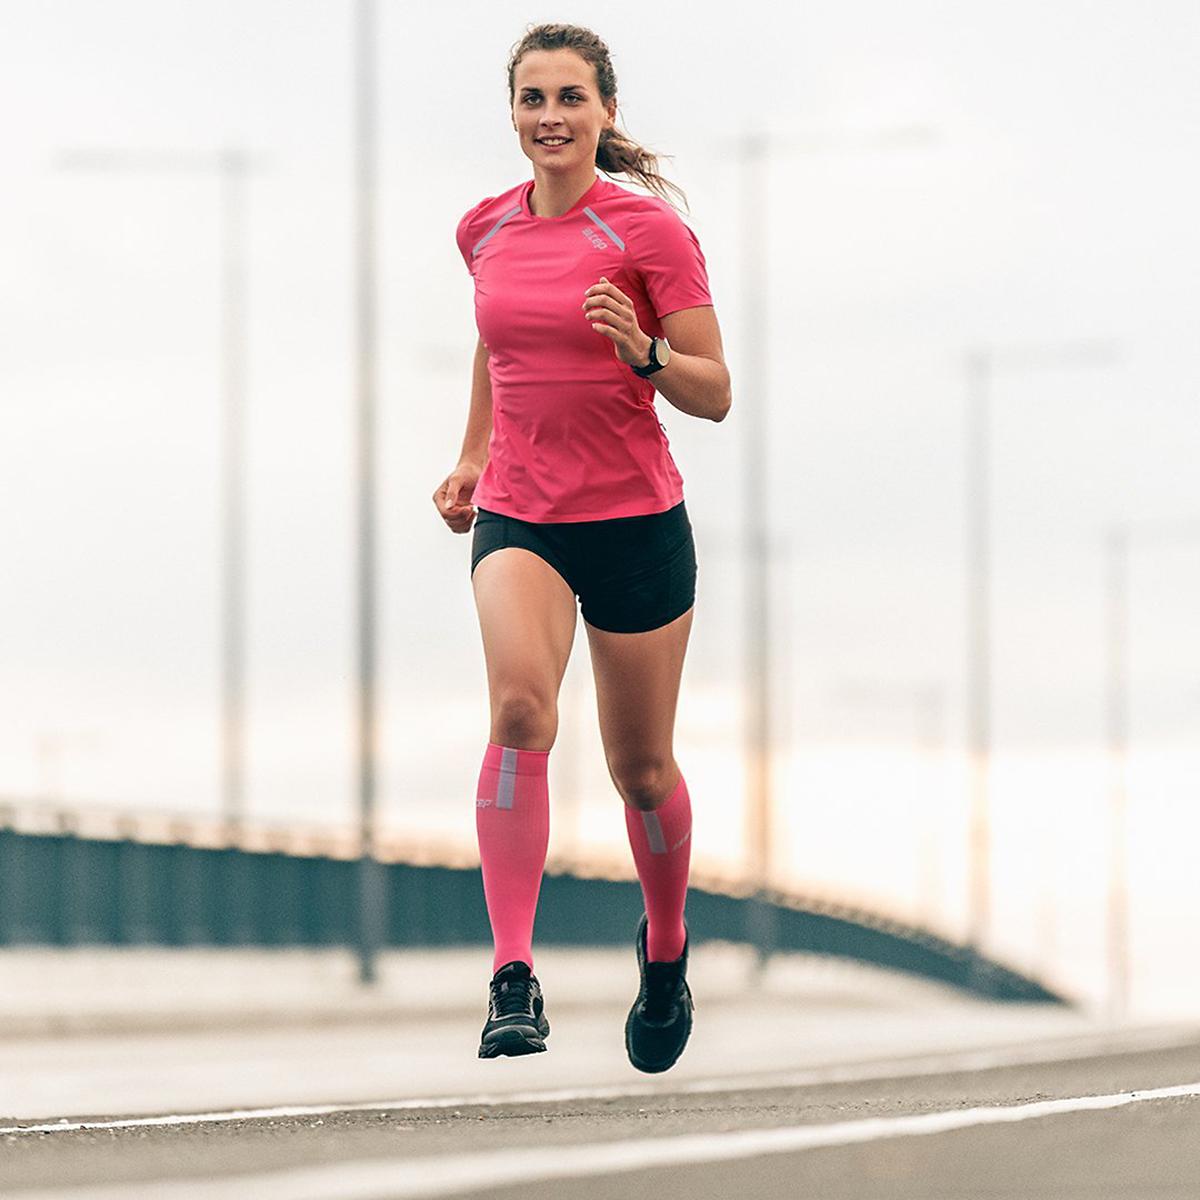 Women's Cep Compression Compression Tall Socks 3.0 - Color: Rose/Light Grey - Size: II, Rose/Light Grey, large, image 3